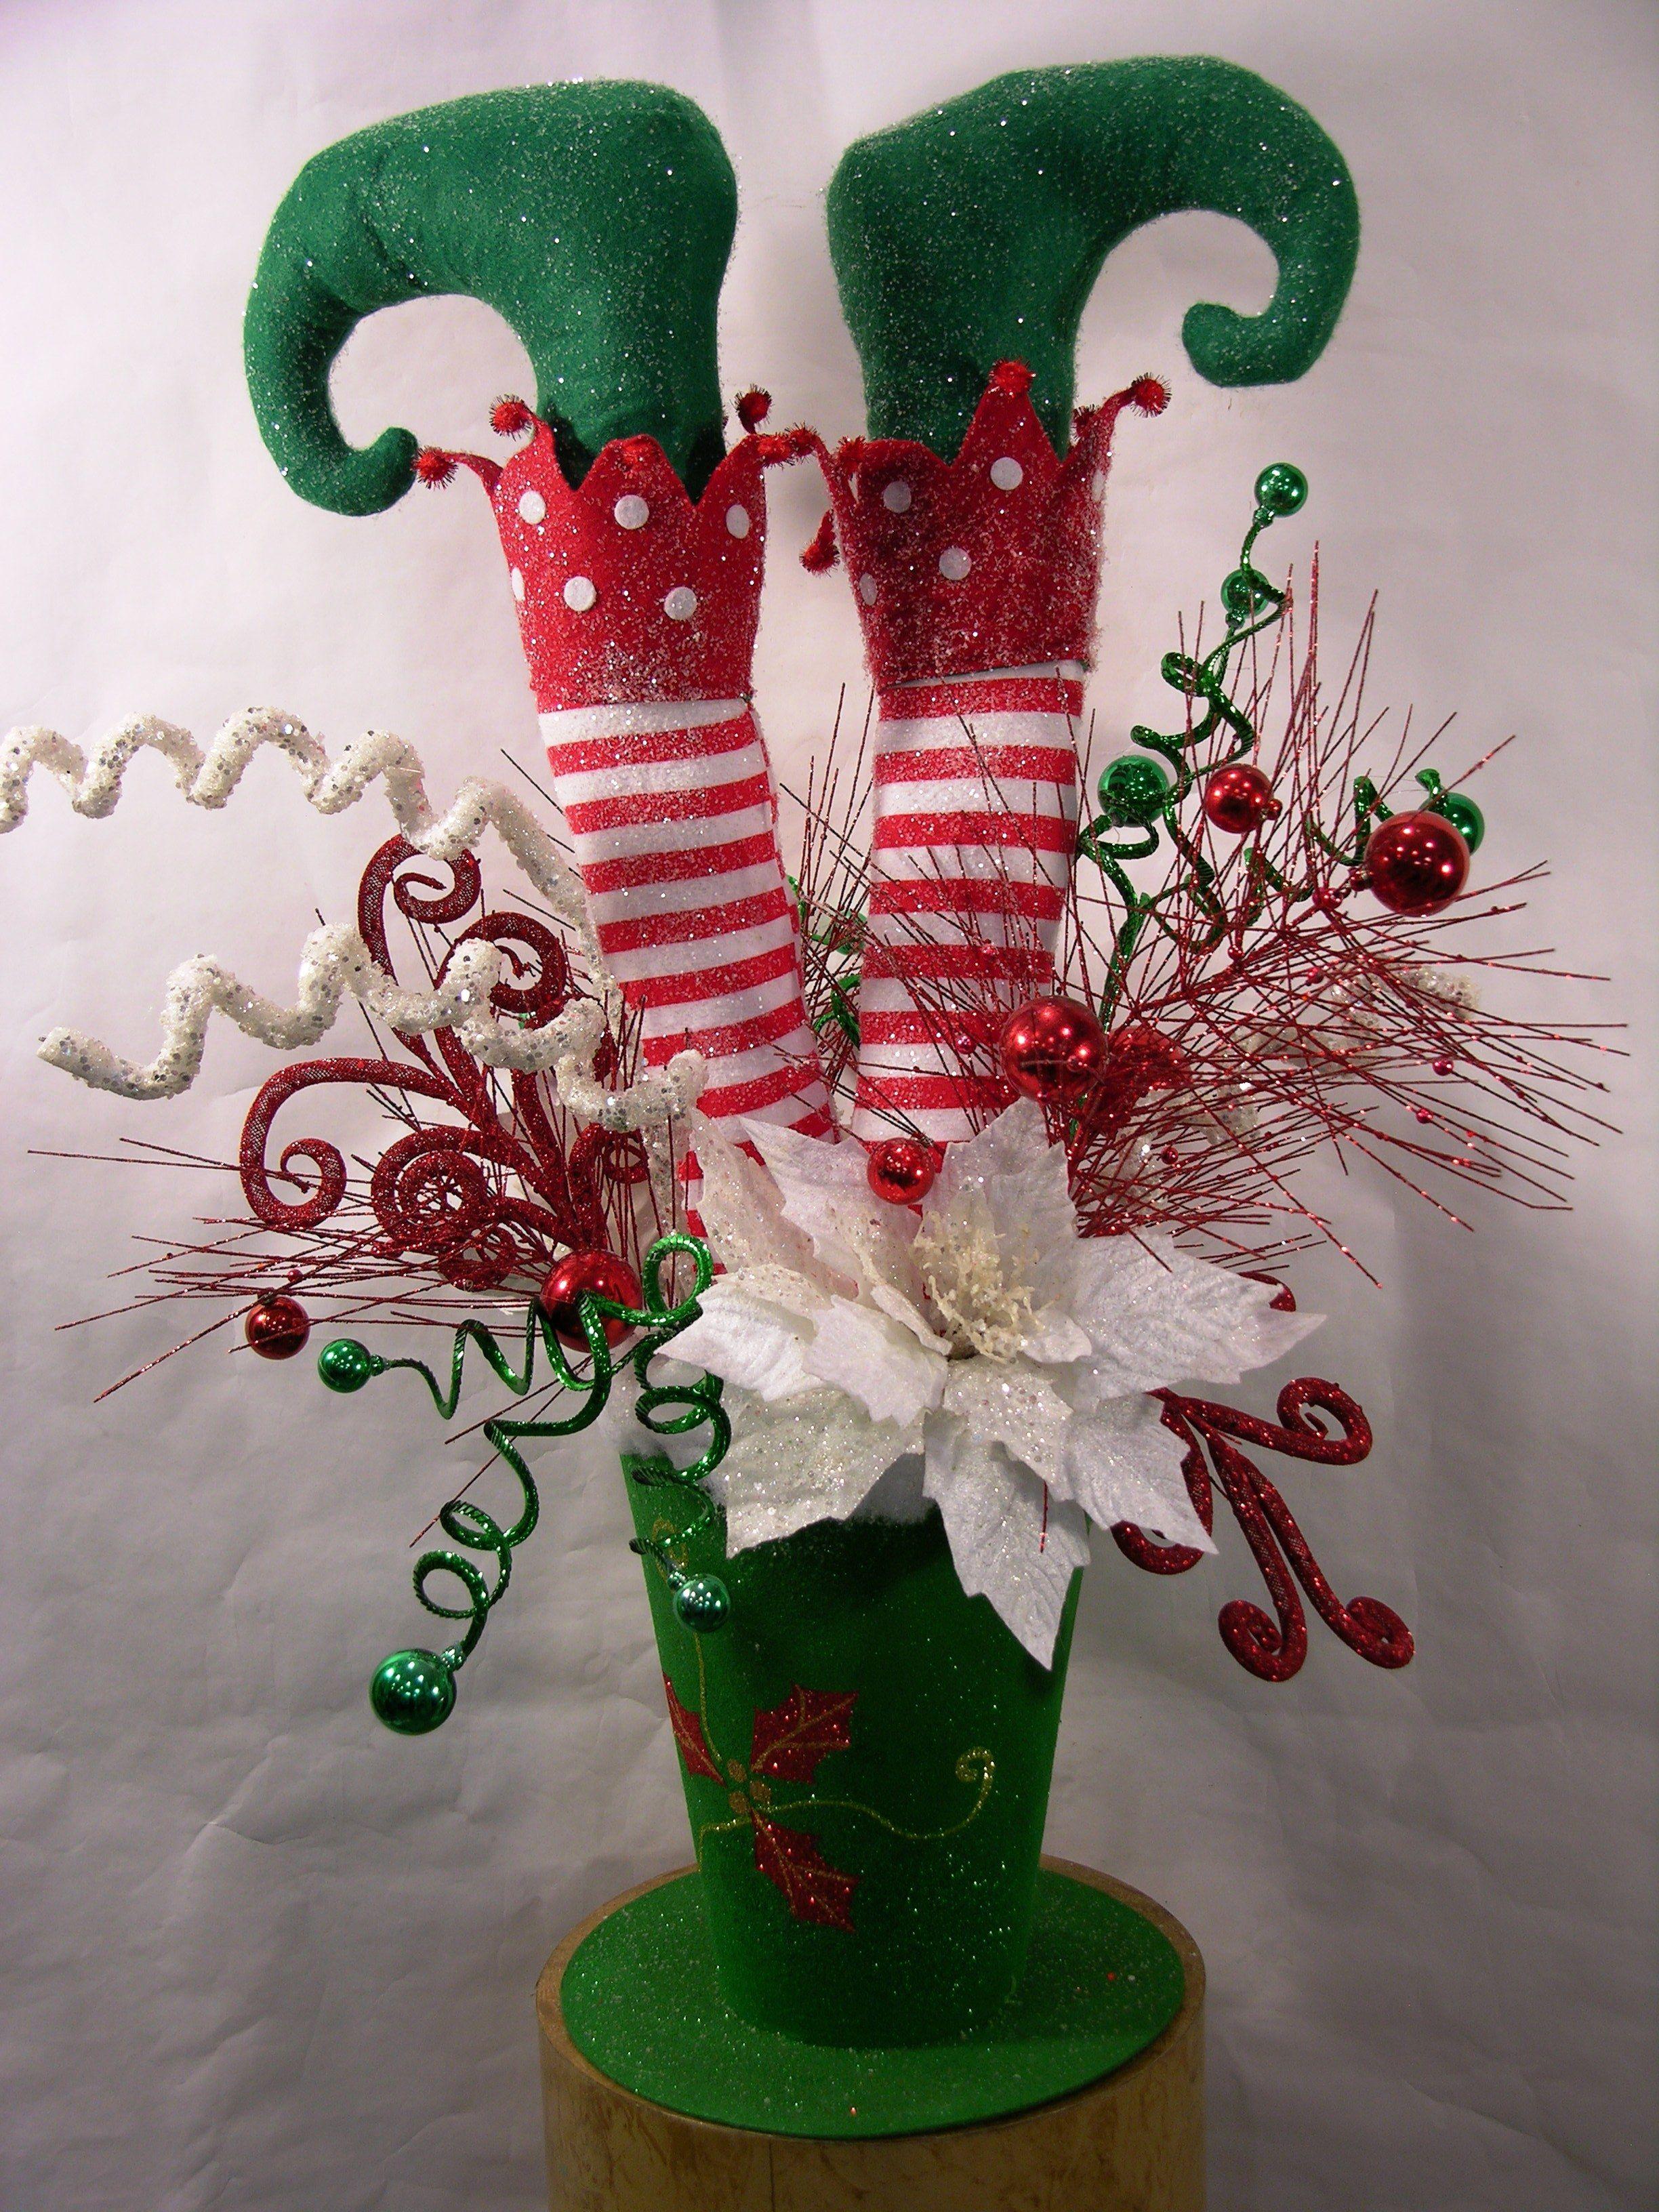 How to make a christmas elf decoration - Elf In Hat Christmas Arrangement Elf Centerpieceschristmas Centerpieceschristmas Elf Decorationsdiy